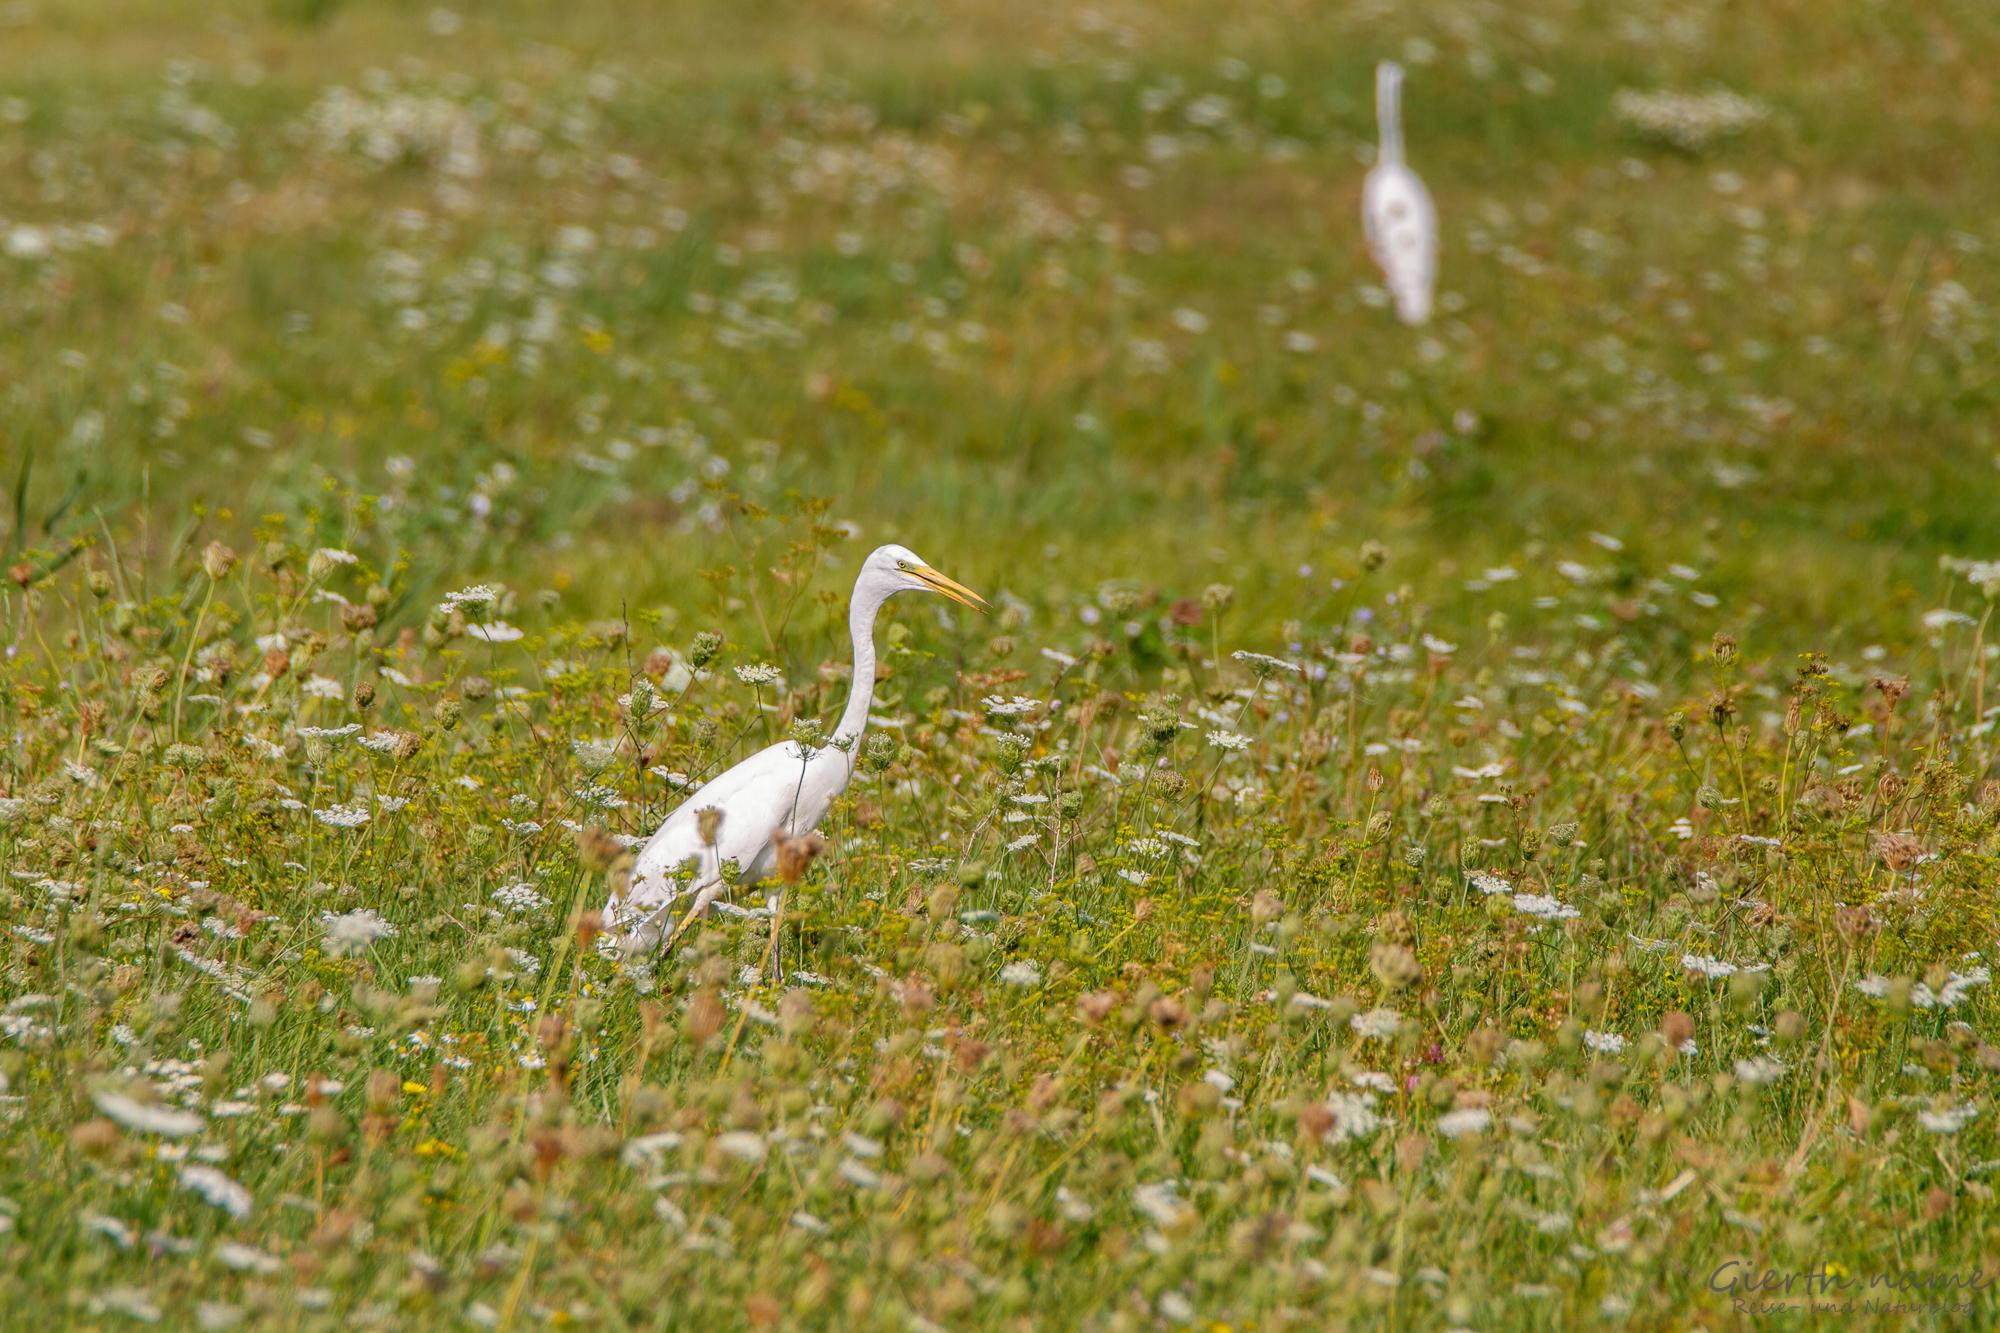 Silberreiher - Great Egret - Ardea alba